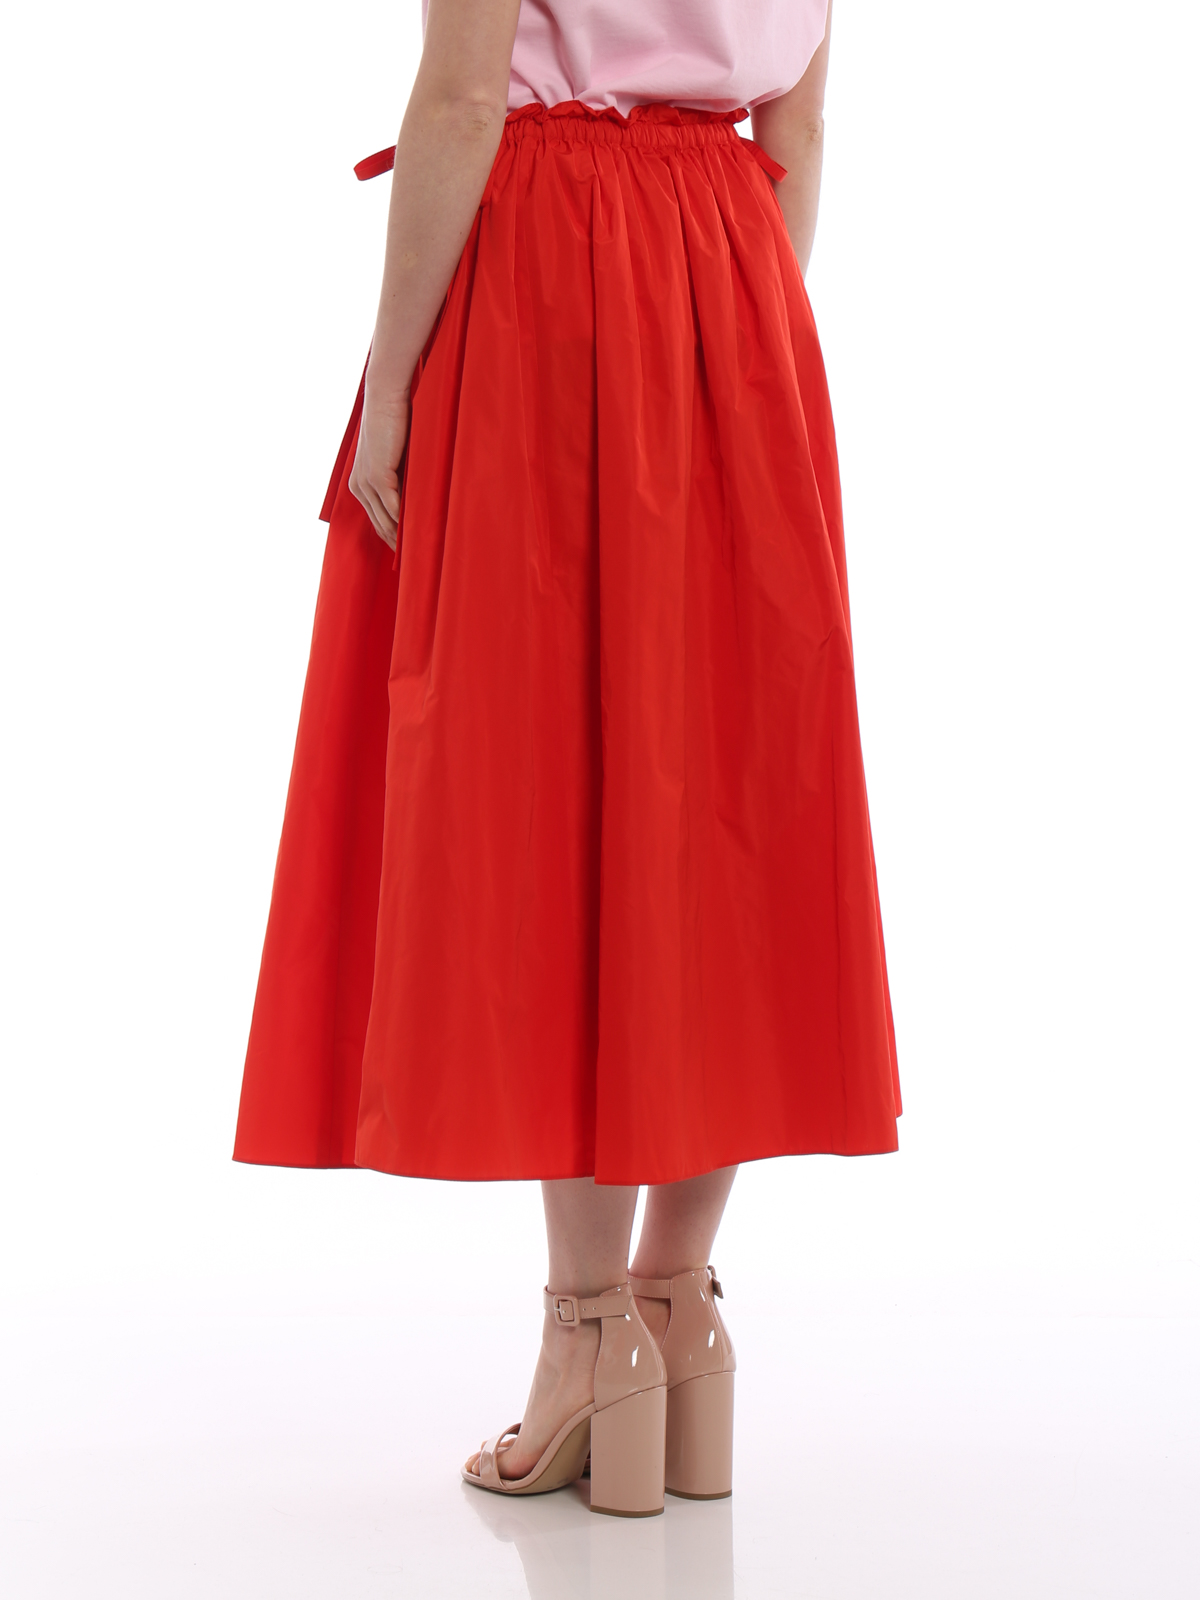 6de3371599 Solid red satin circle long skirt shop online: KENZO. KENZO buy online  Solid red satin circle long skirt. KENZO: Knee length skirts ...